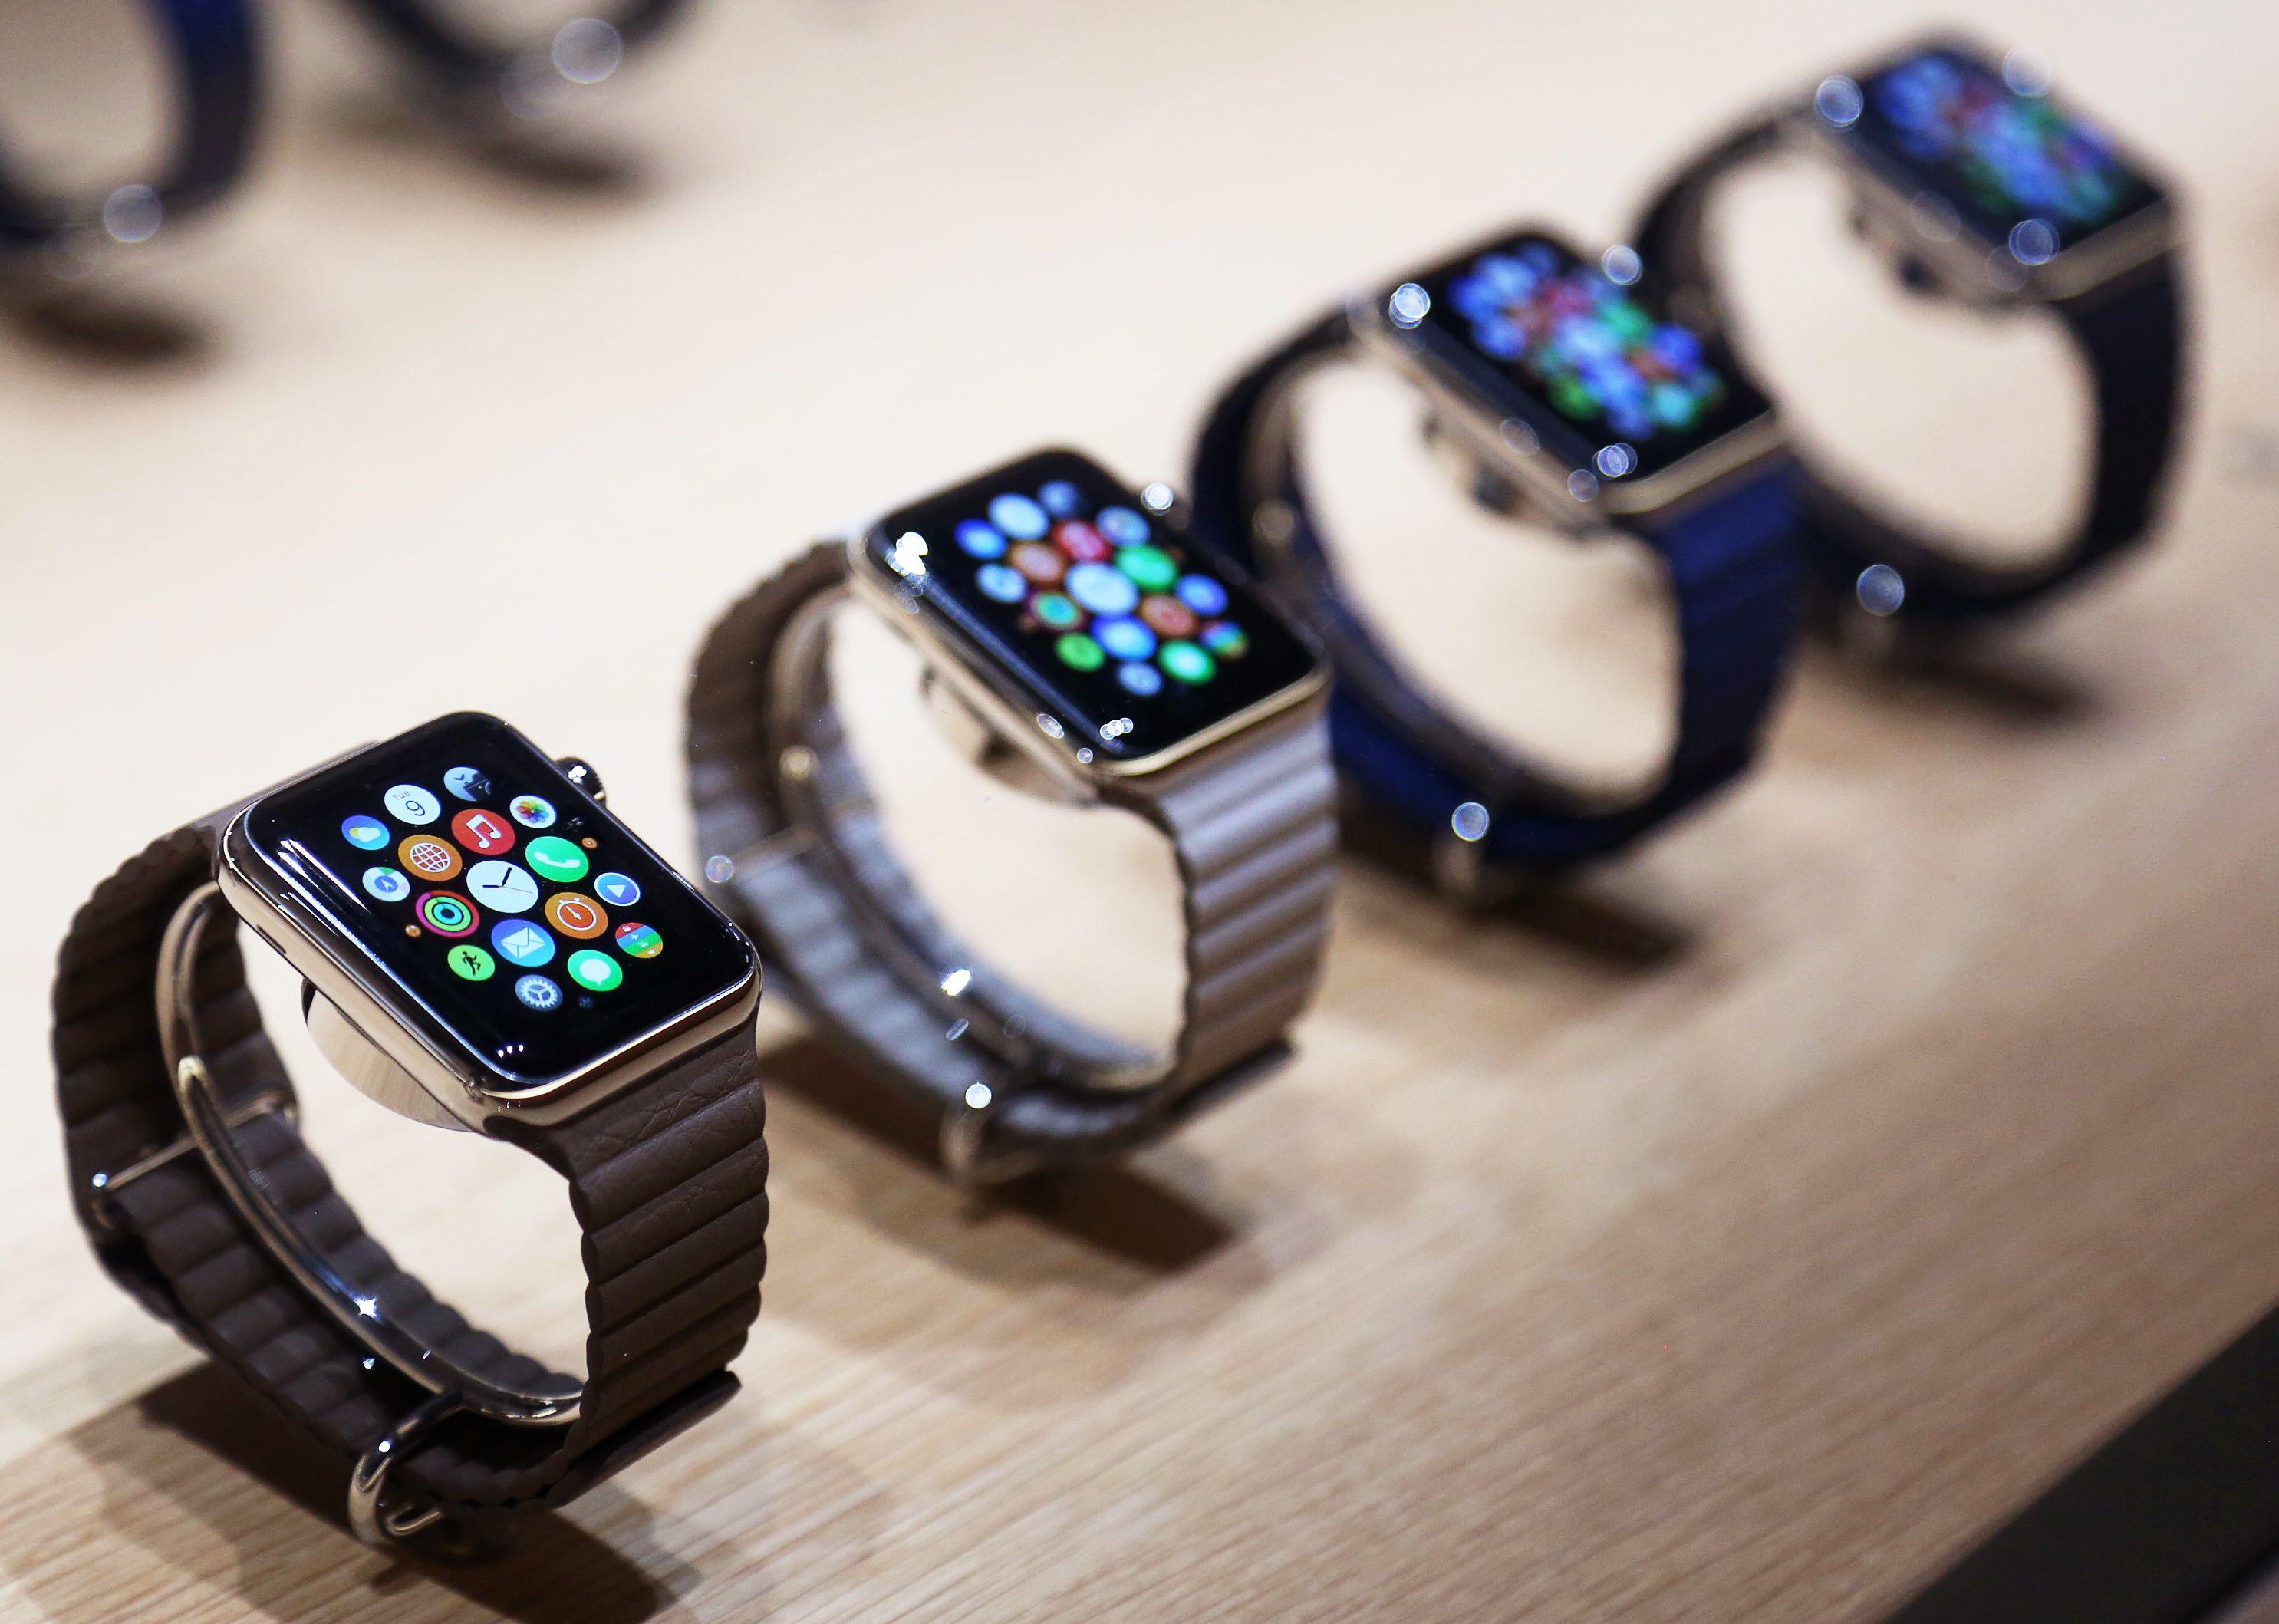 L'apple Watch a été présenté lundi 9 mars